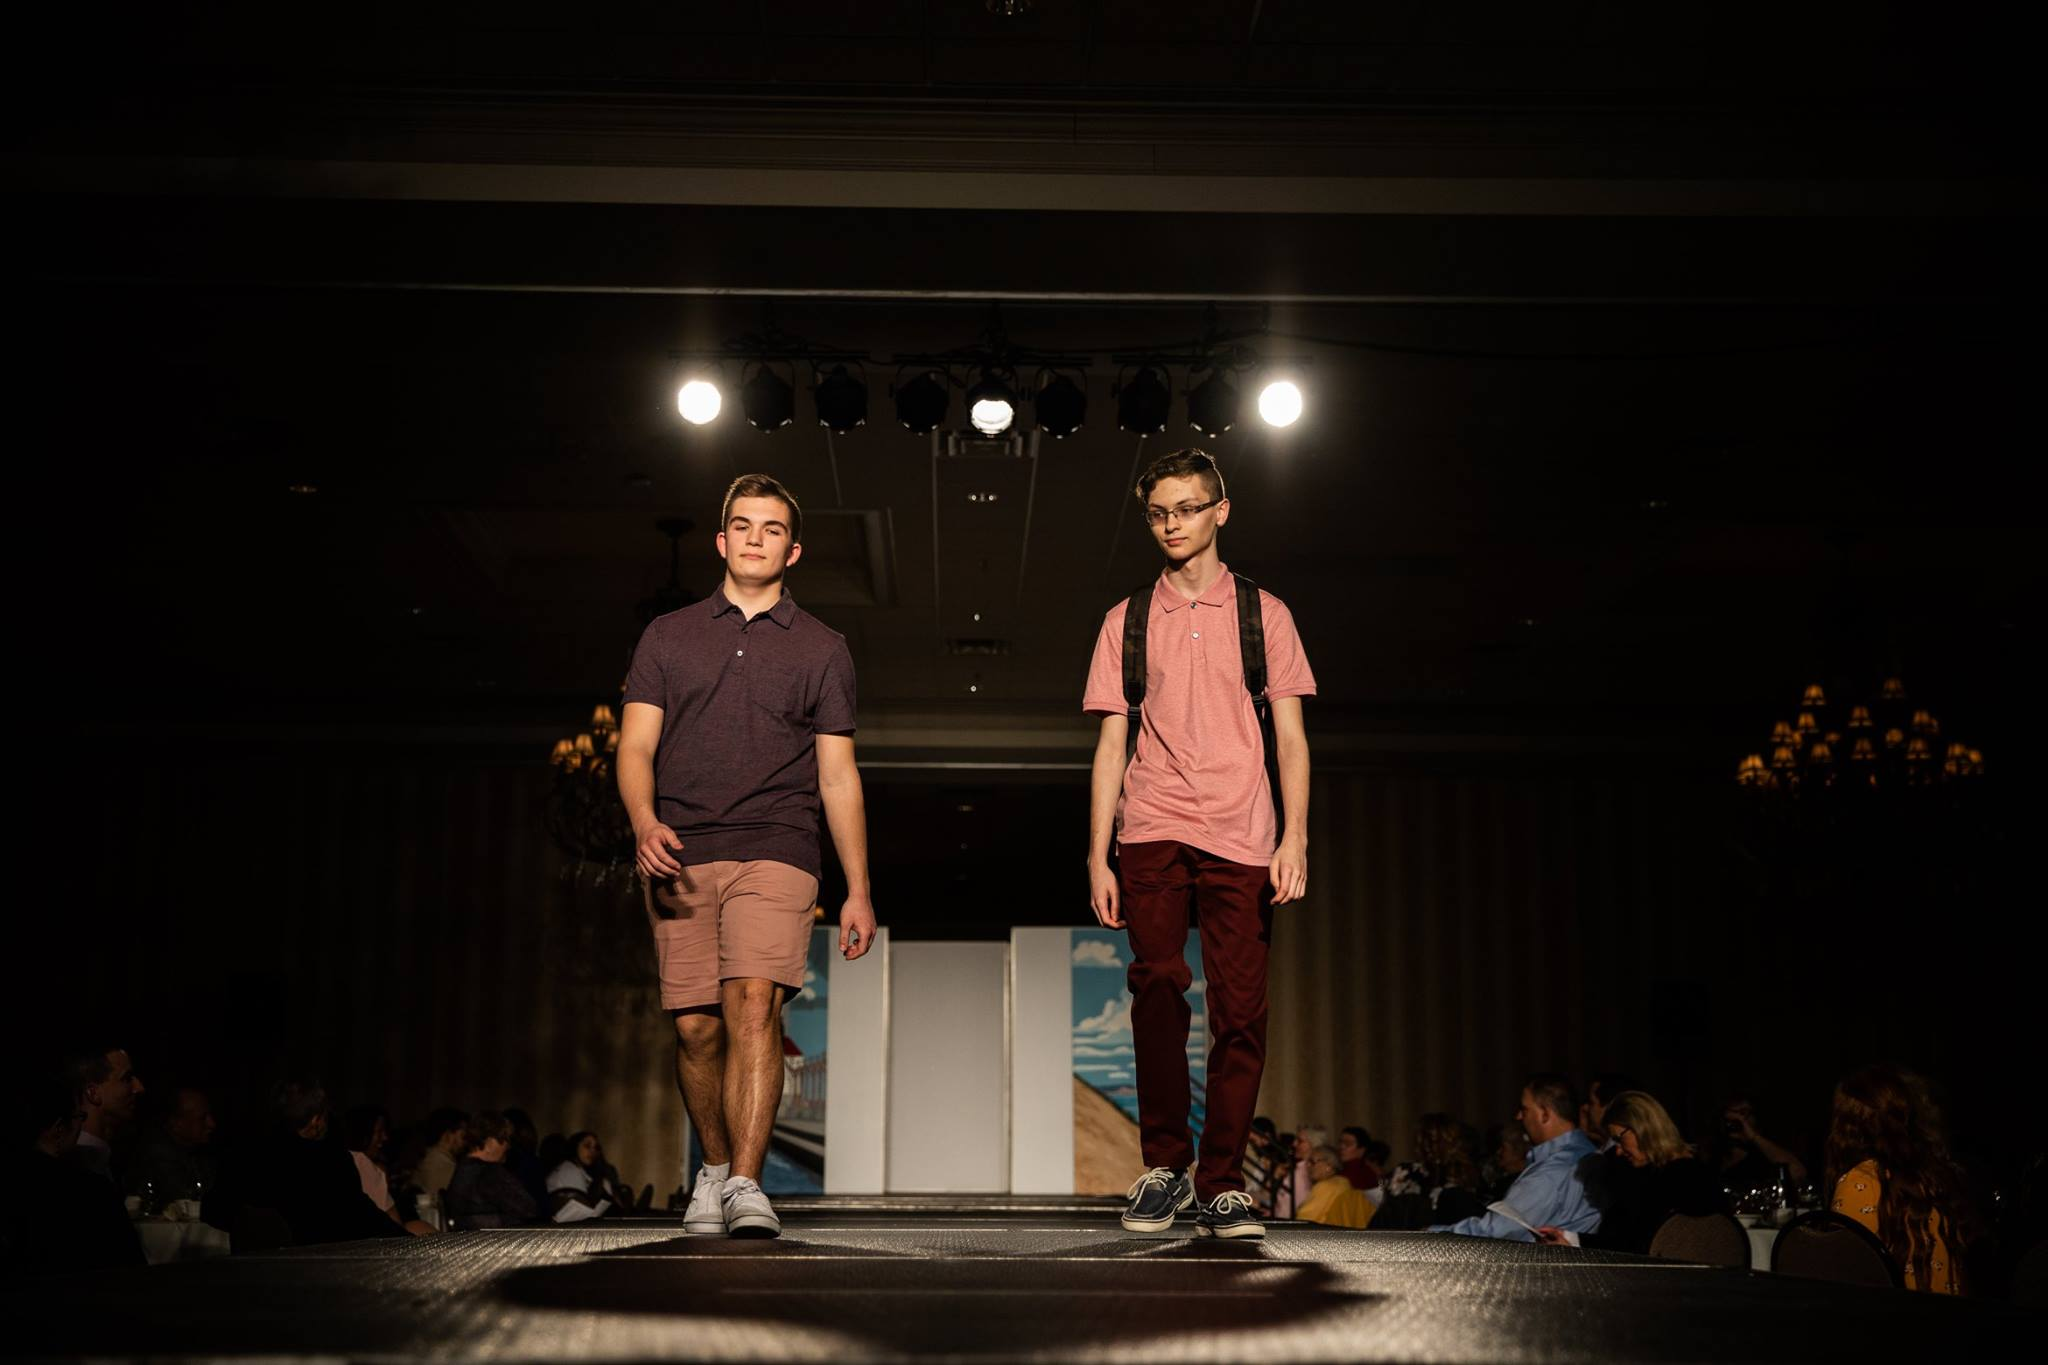 Lutheran_North_High_School_Macomb_Michigan_LHN_Fashion_Show_2019 (9).jpg